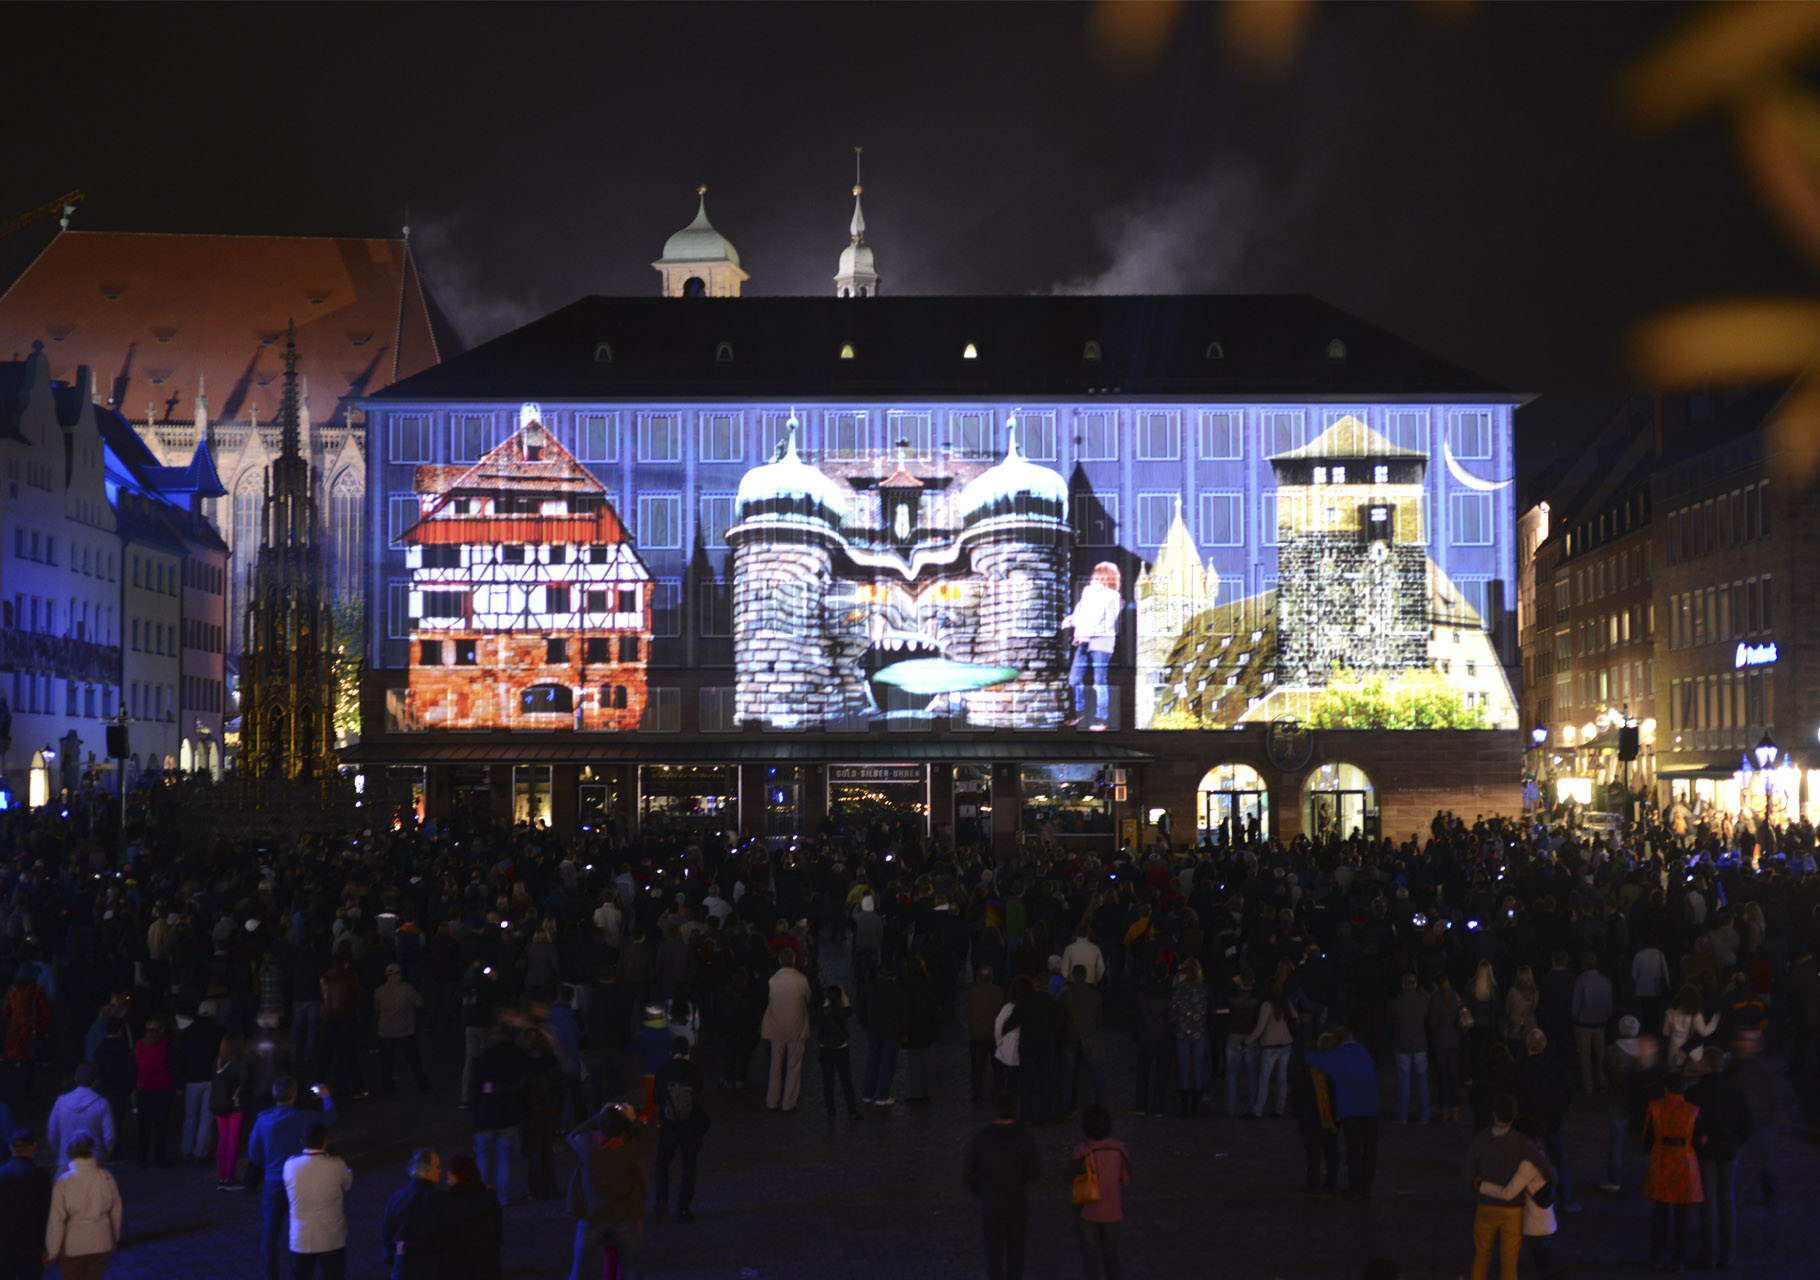 Phantastonaut - Blaue Nacht Nürnberg 2013